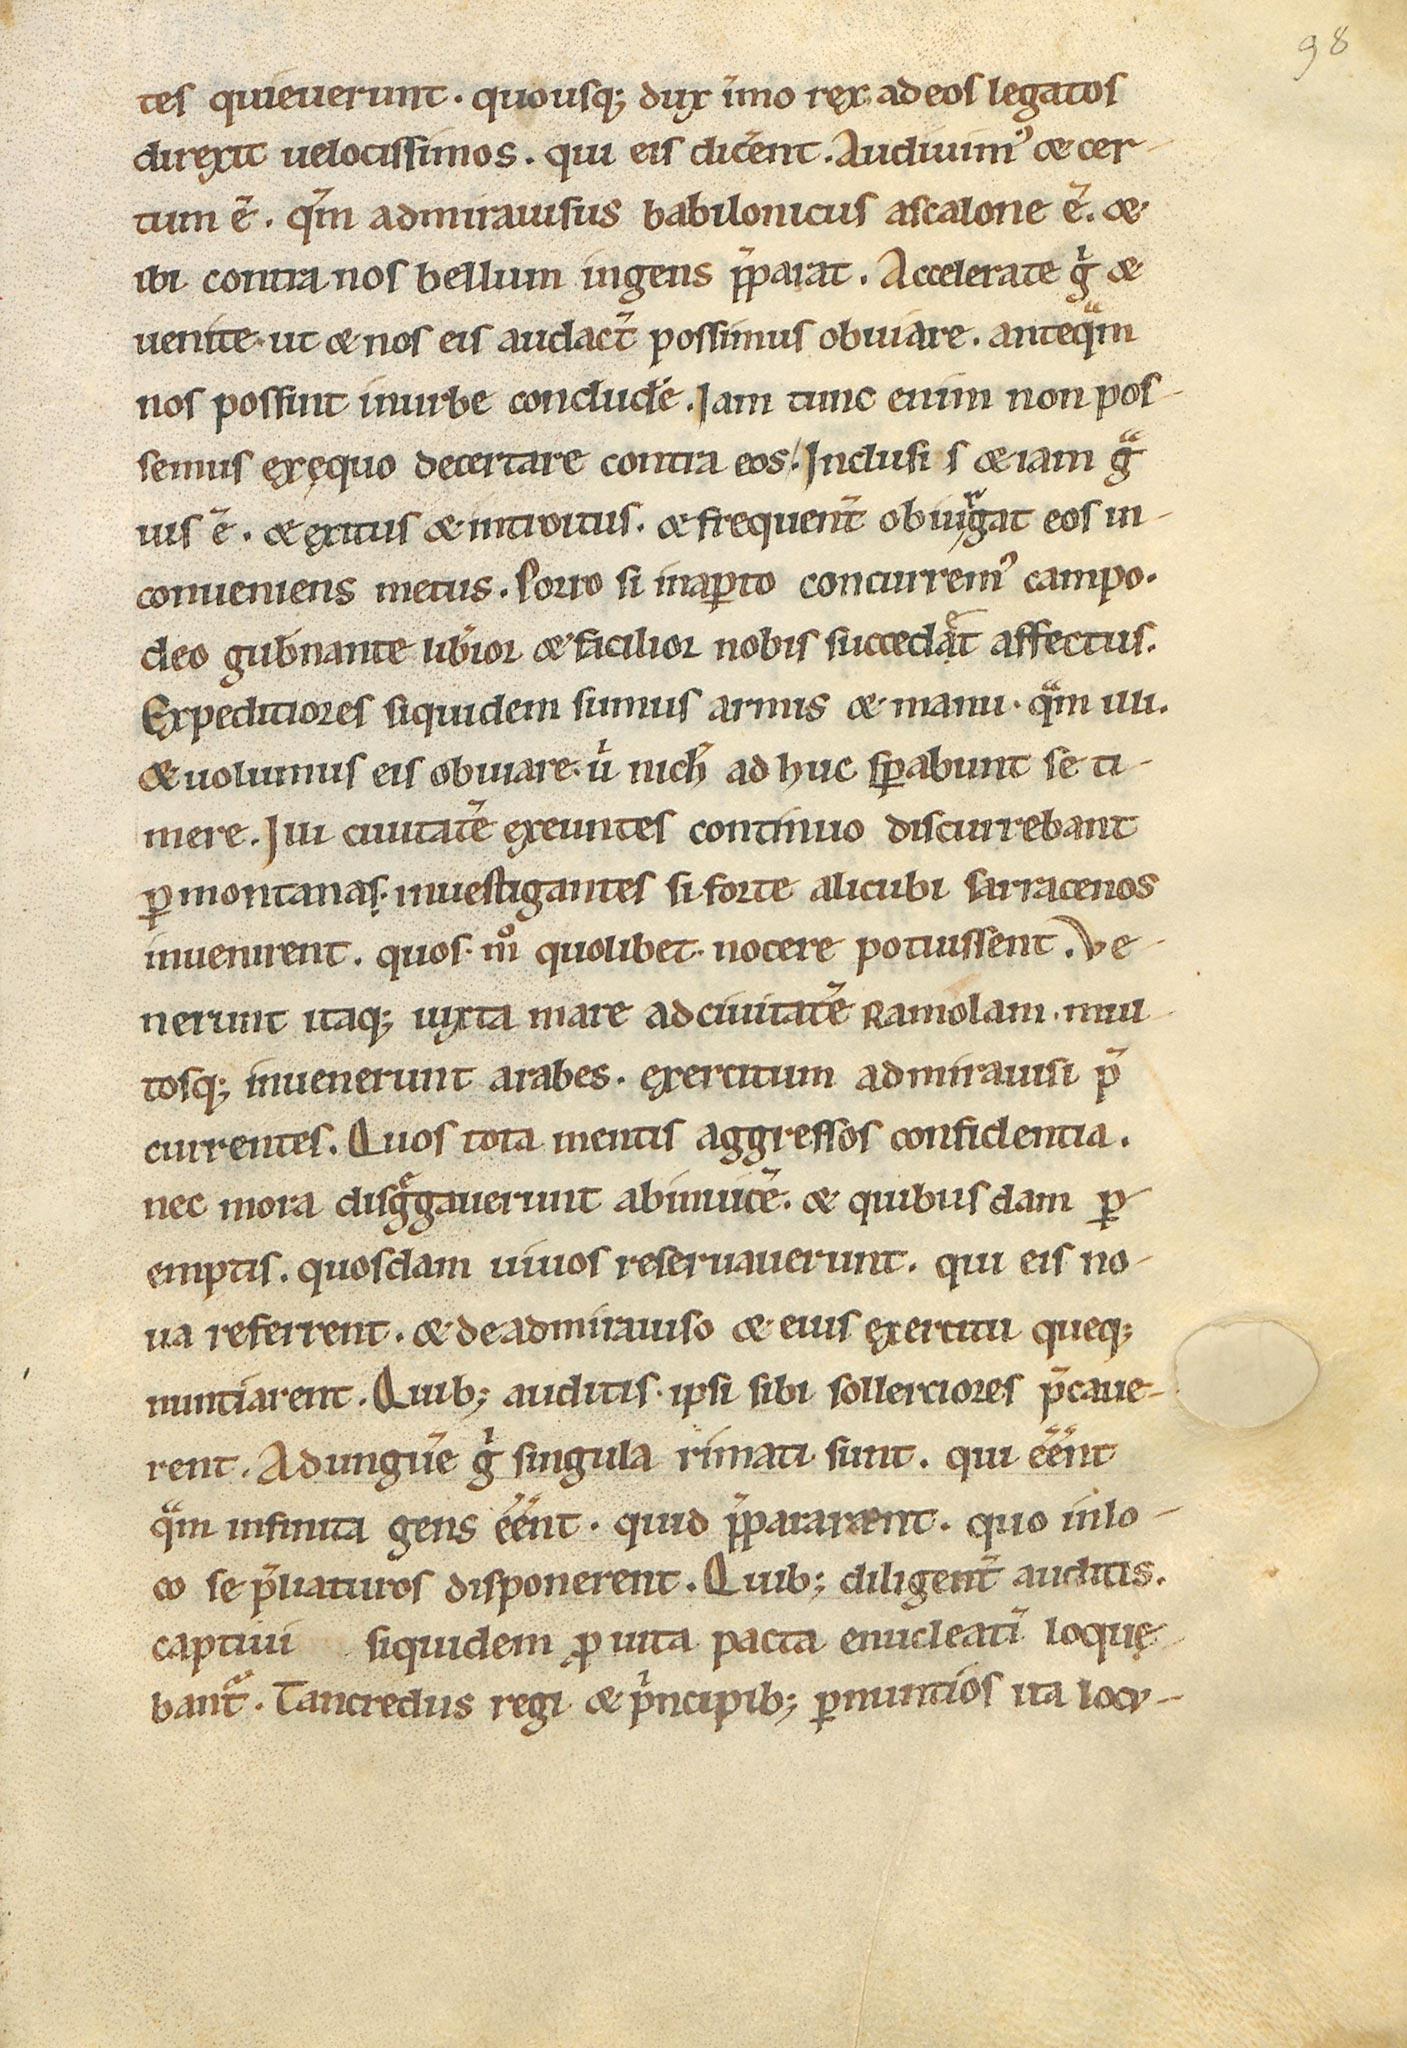 Manuscrit-Historia-Hierosolimitana-98r°